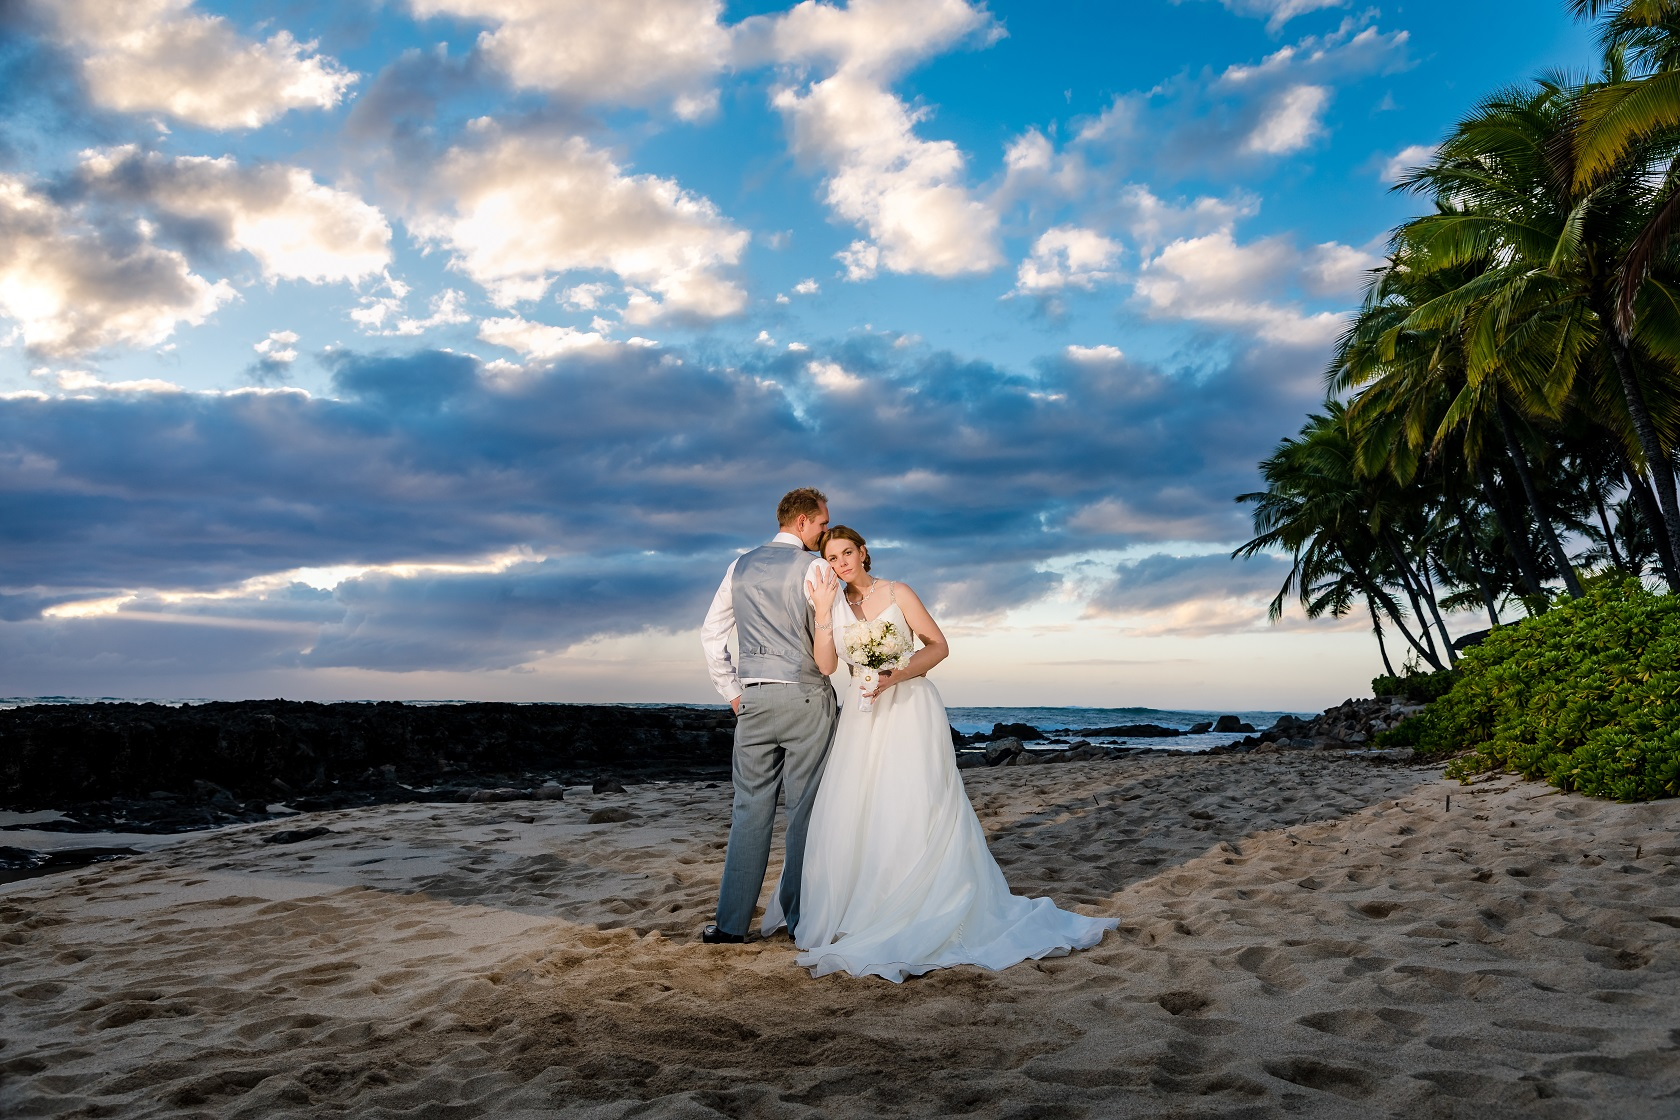 bride groom sunset photo on beach palm trees